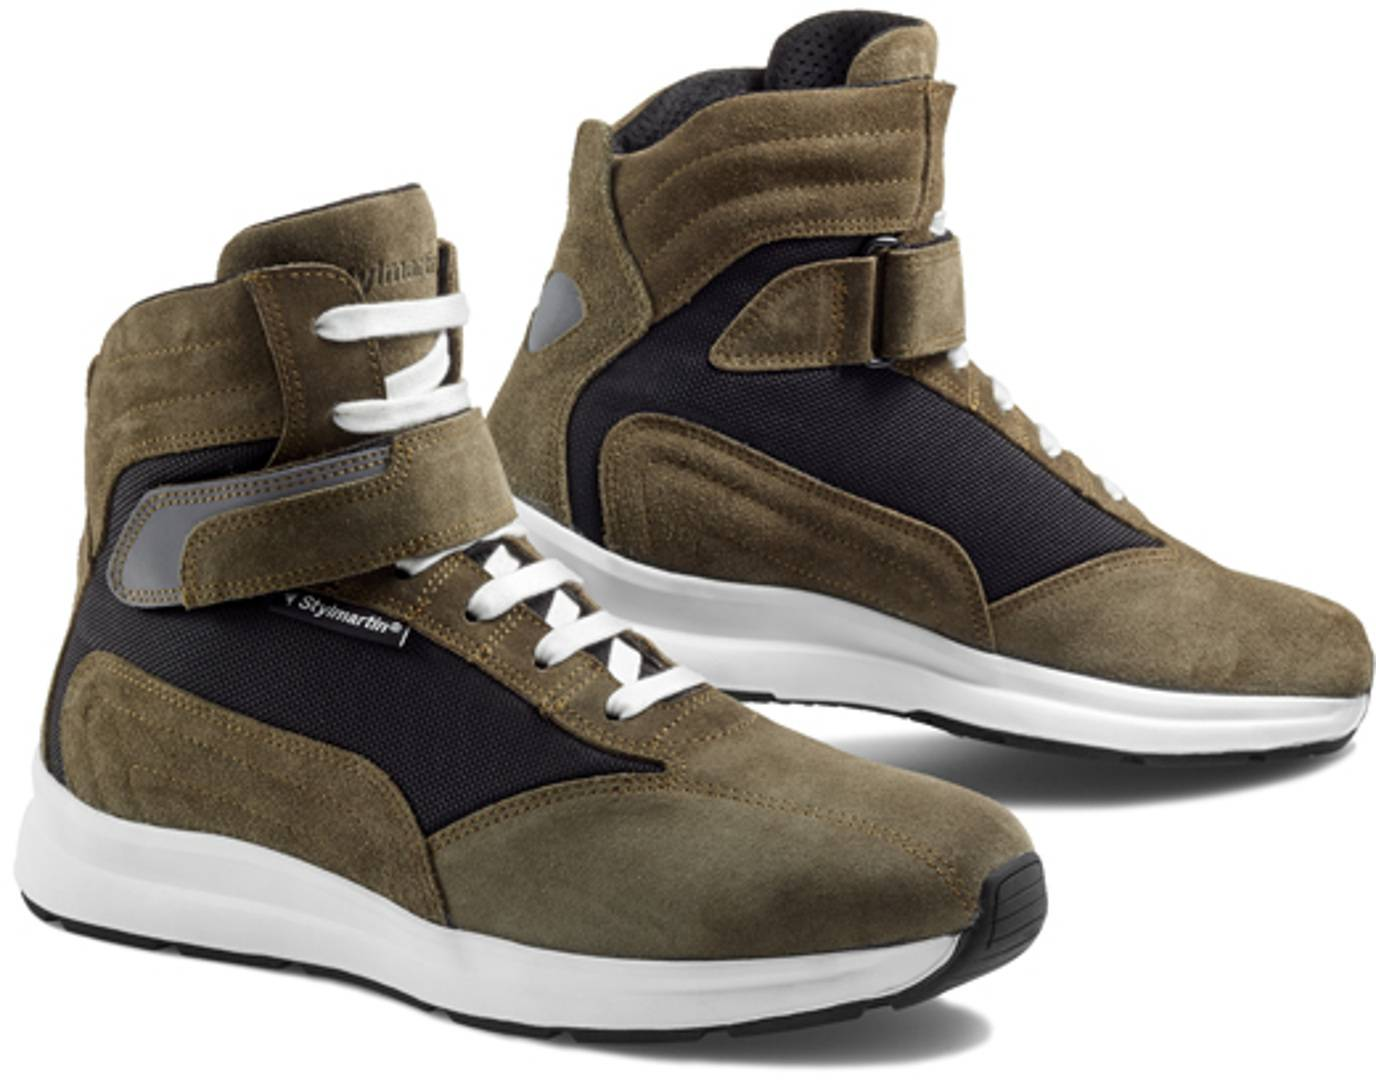 Stylmartin Audax Chaussures de moto Noir Vert taille : 42